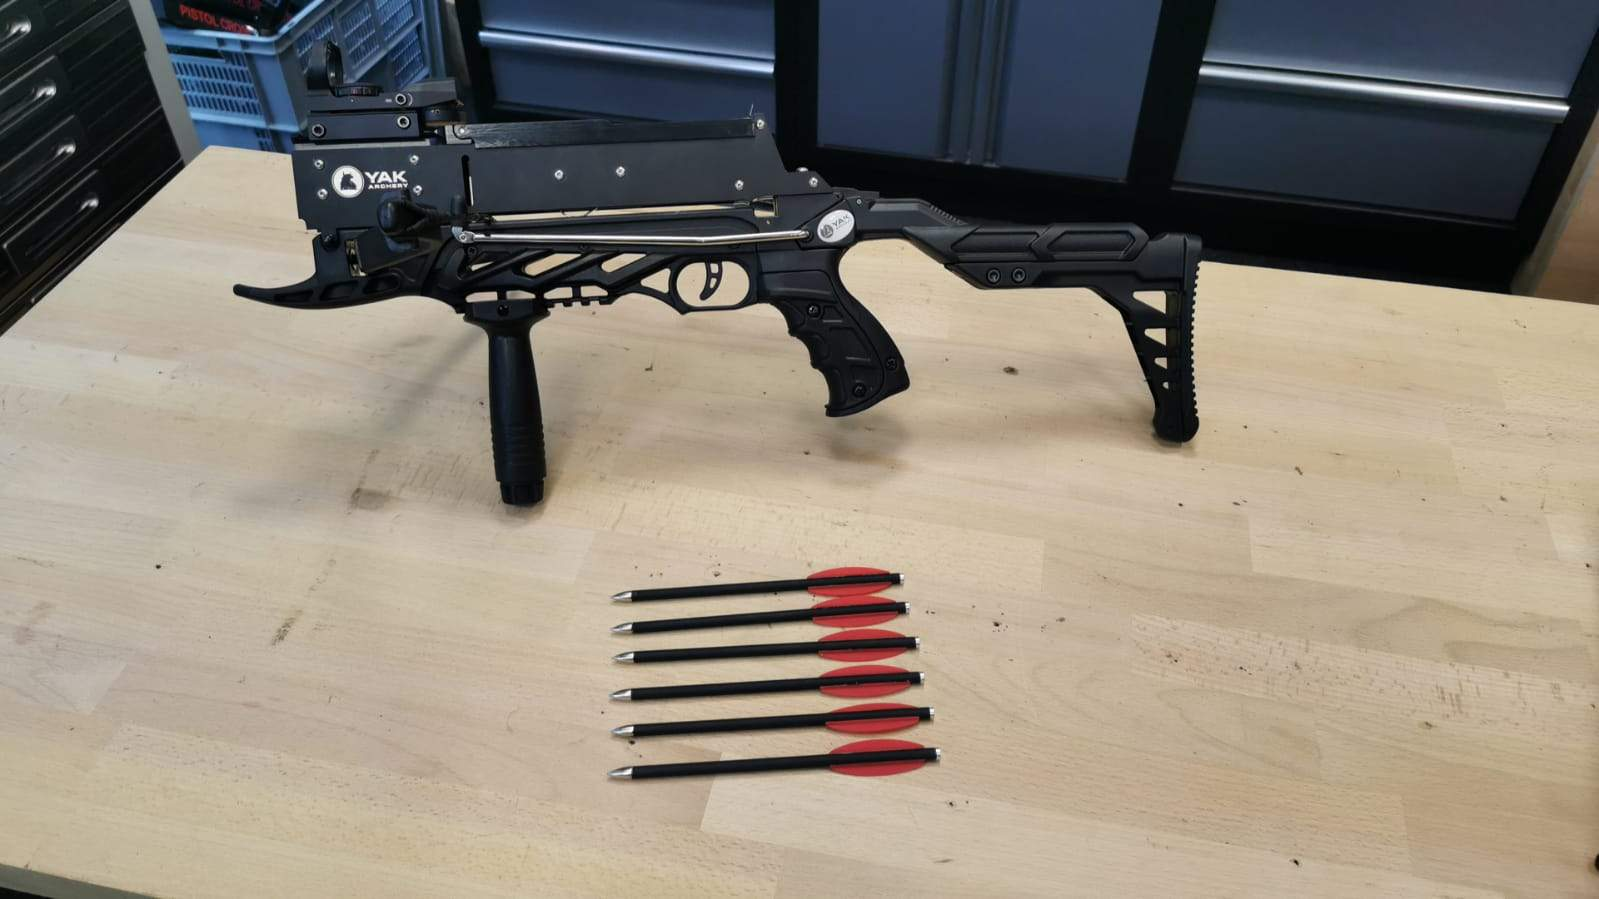 YAK Archery Pistolenarmbrust Terminator II